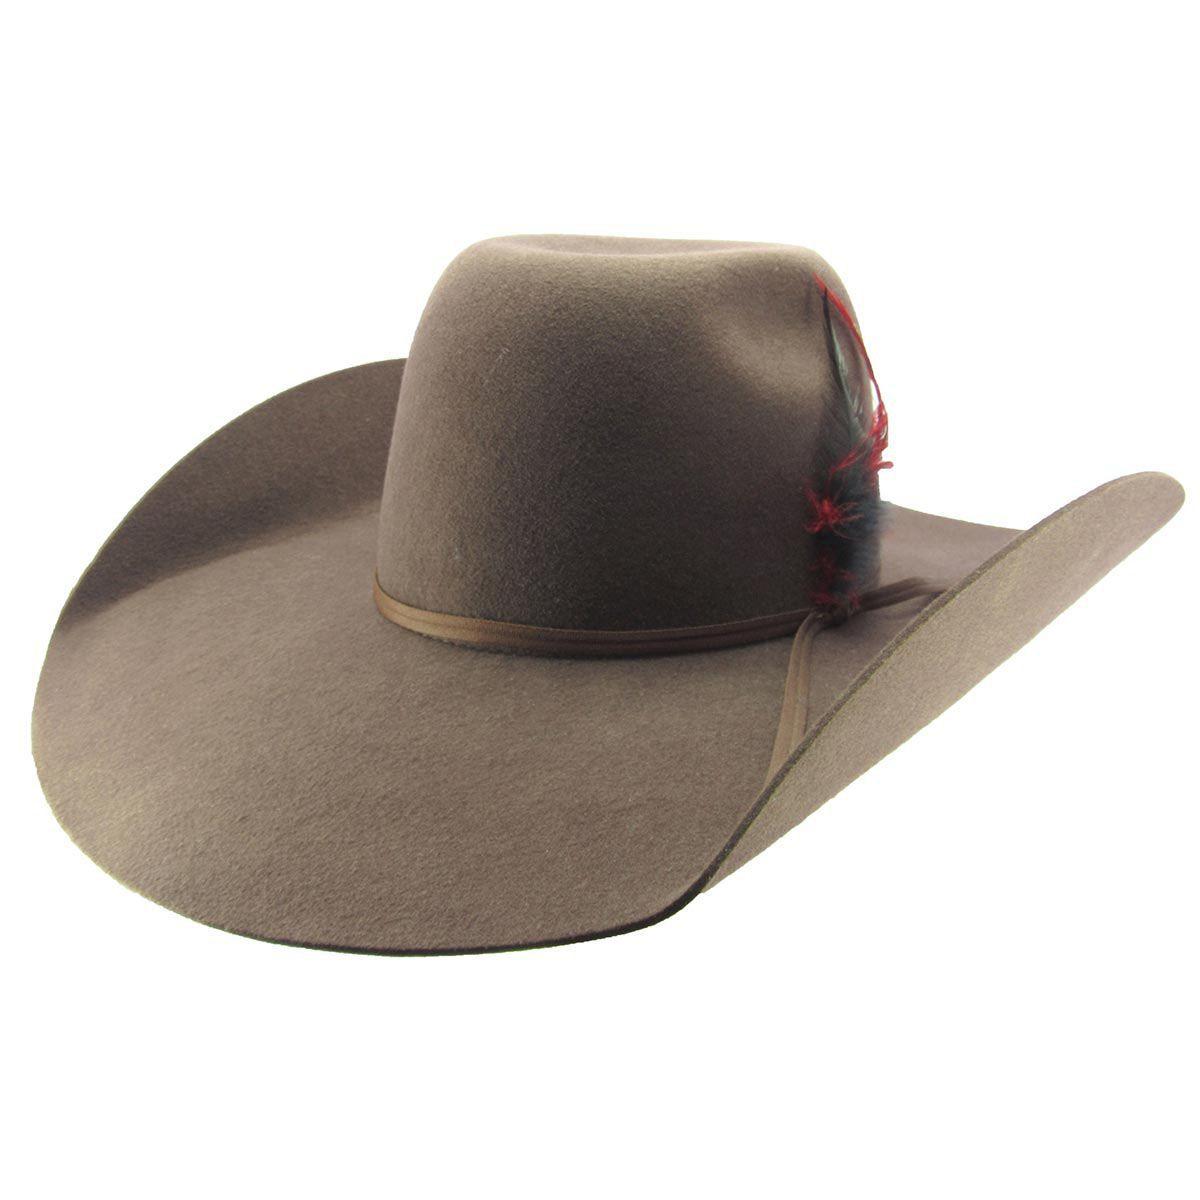 Chapéu Pralana Biplay Ii Café Country Aba 13 - Cowboy BR c41cbb8da0f